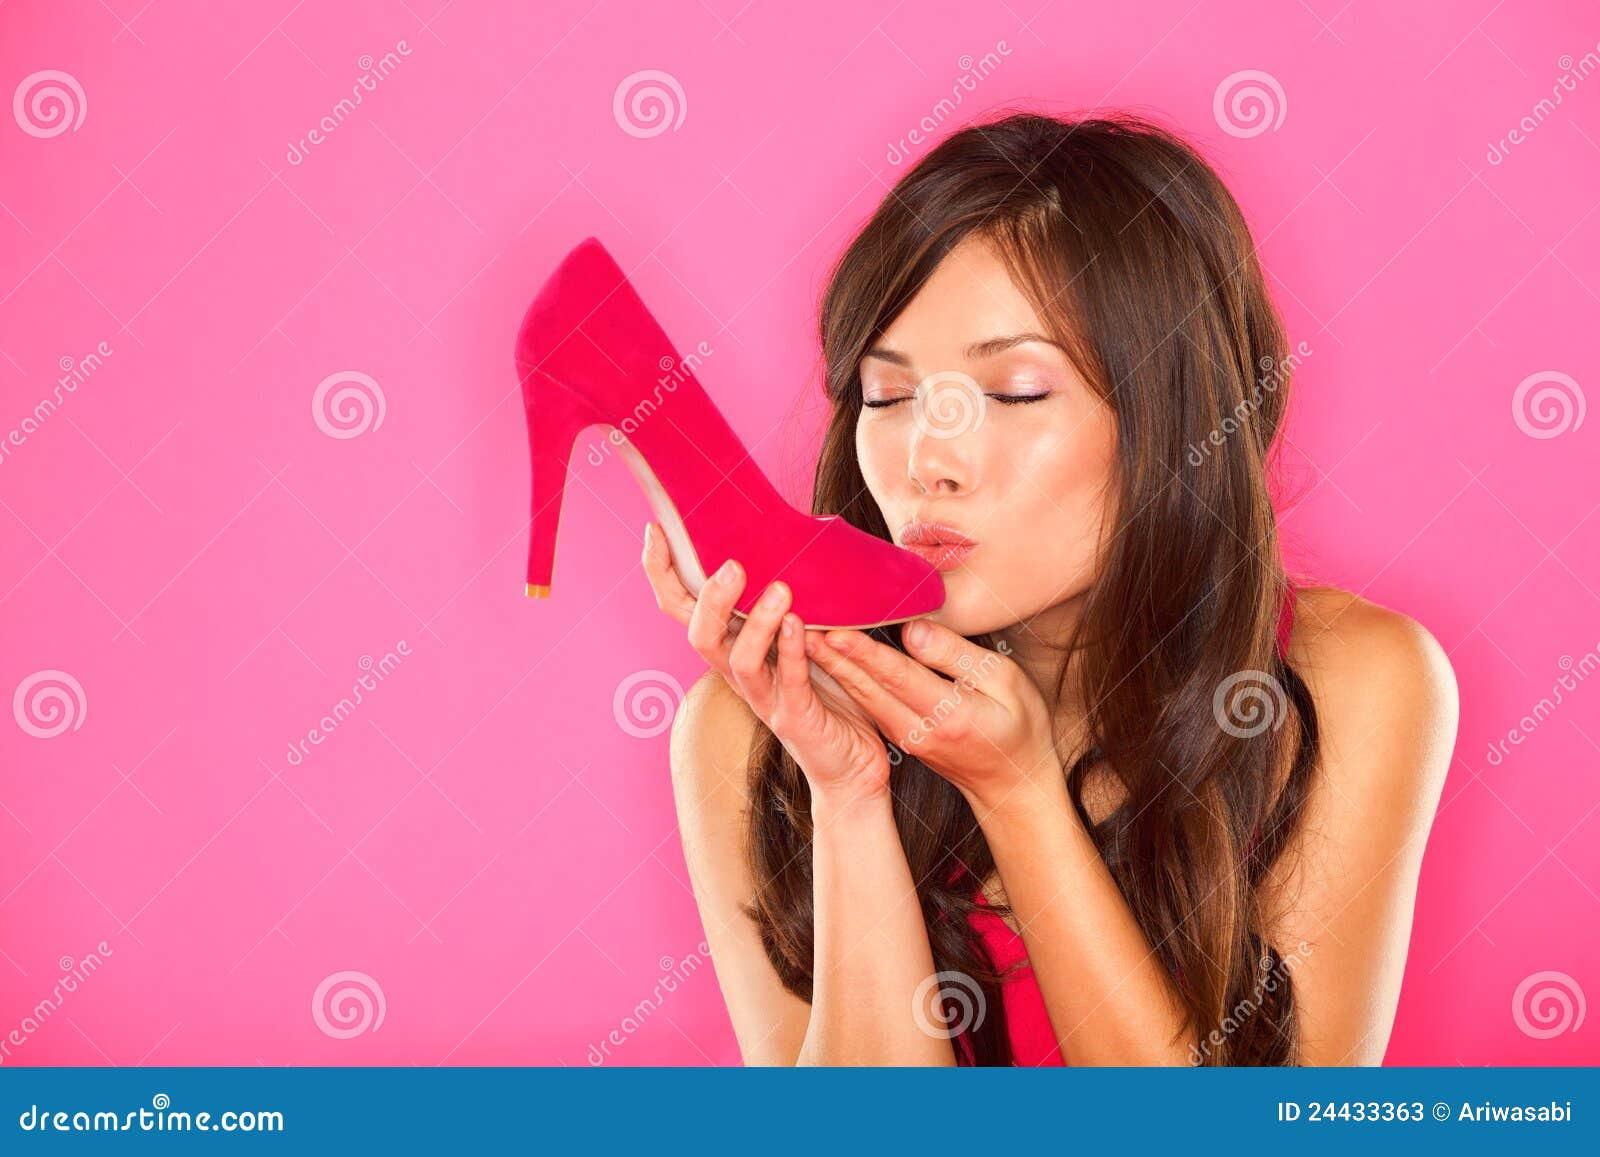 Целуют пятки девушкам 2 фотография